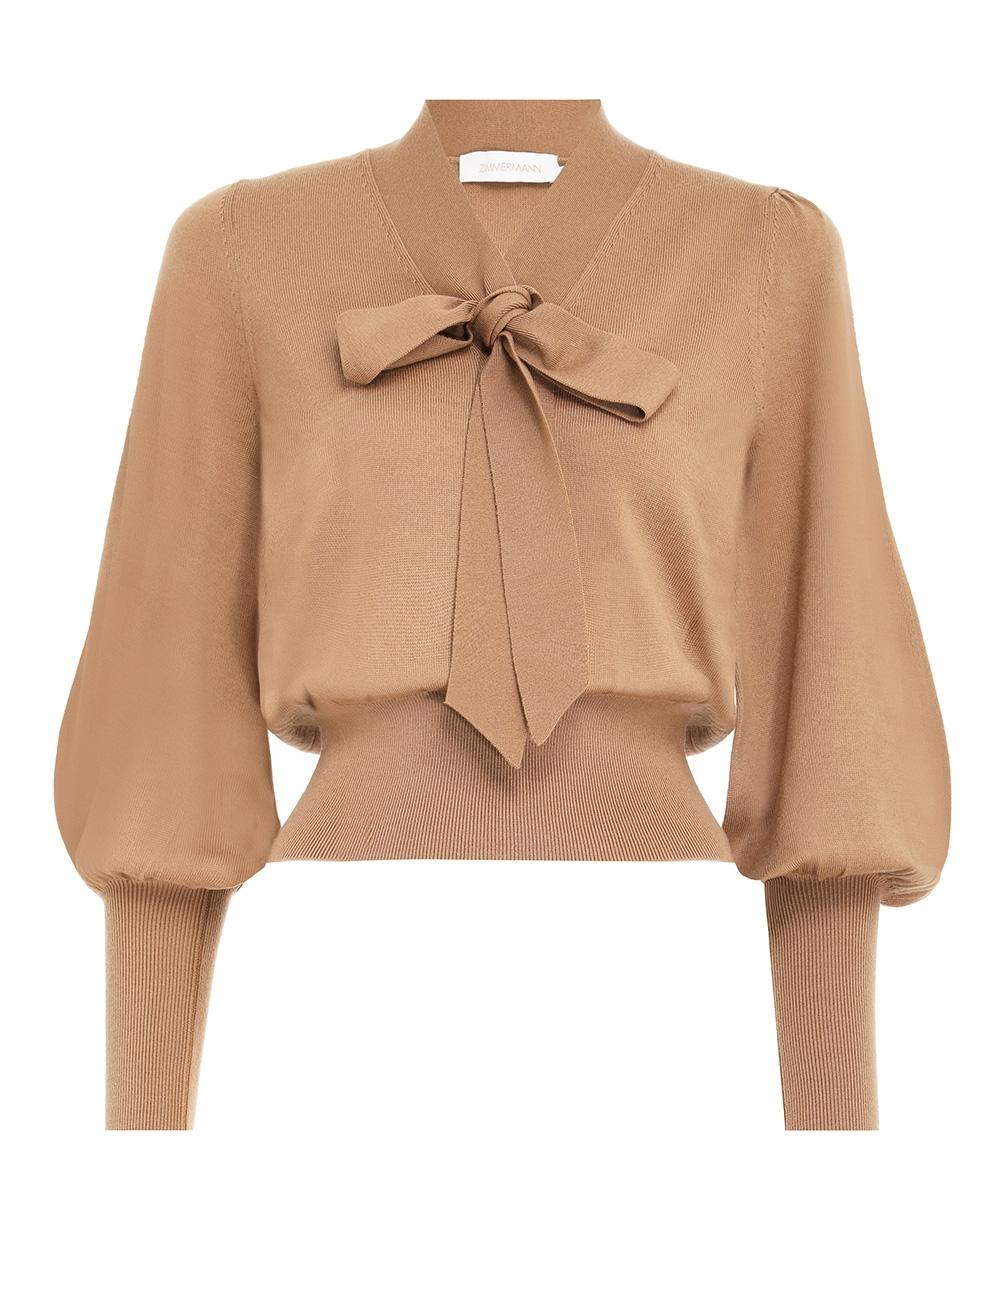 Botanica Tie-Neck Sweater